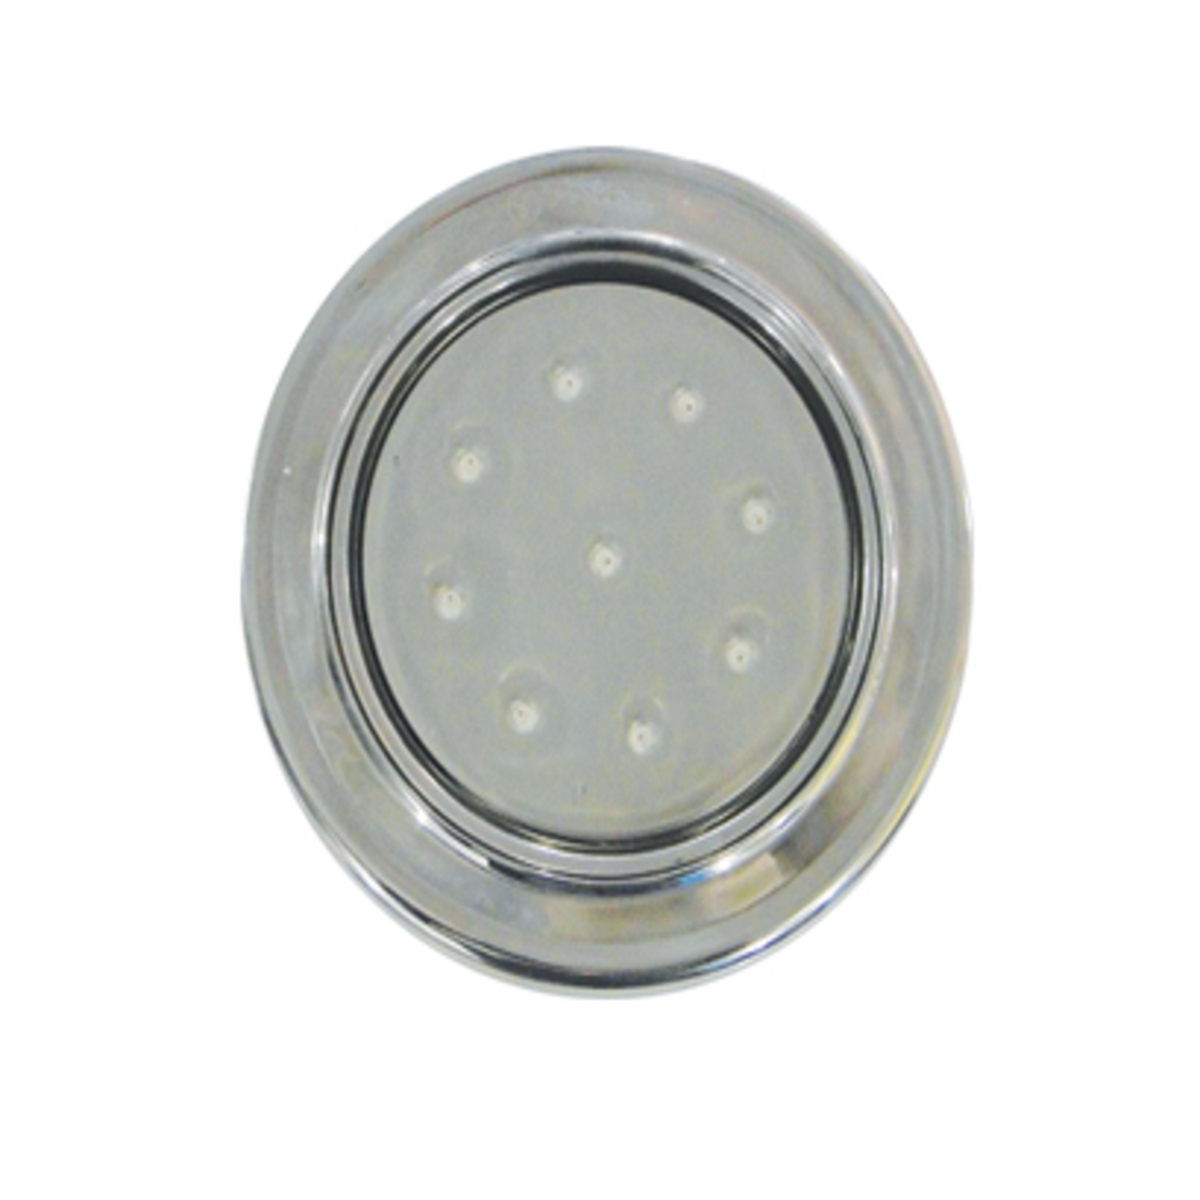 "Refletor Steel Super Led 9 Luz Azul Inox com Plug 1/2"" Pooltec"